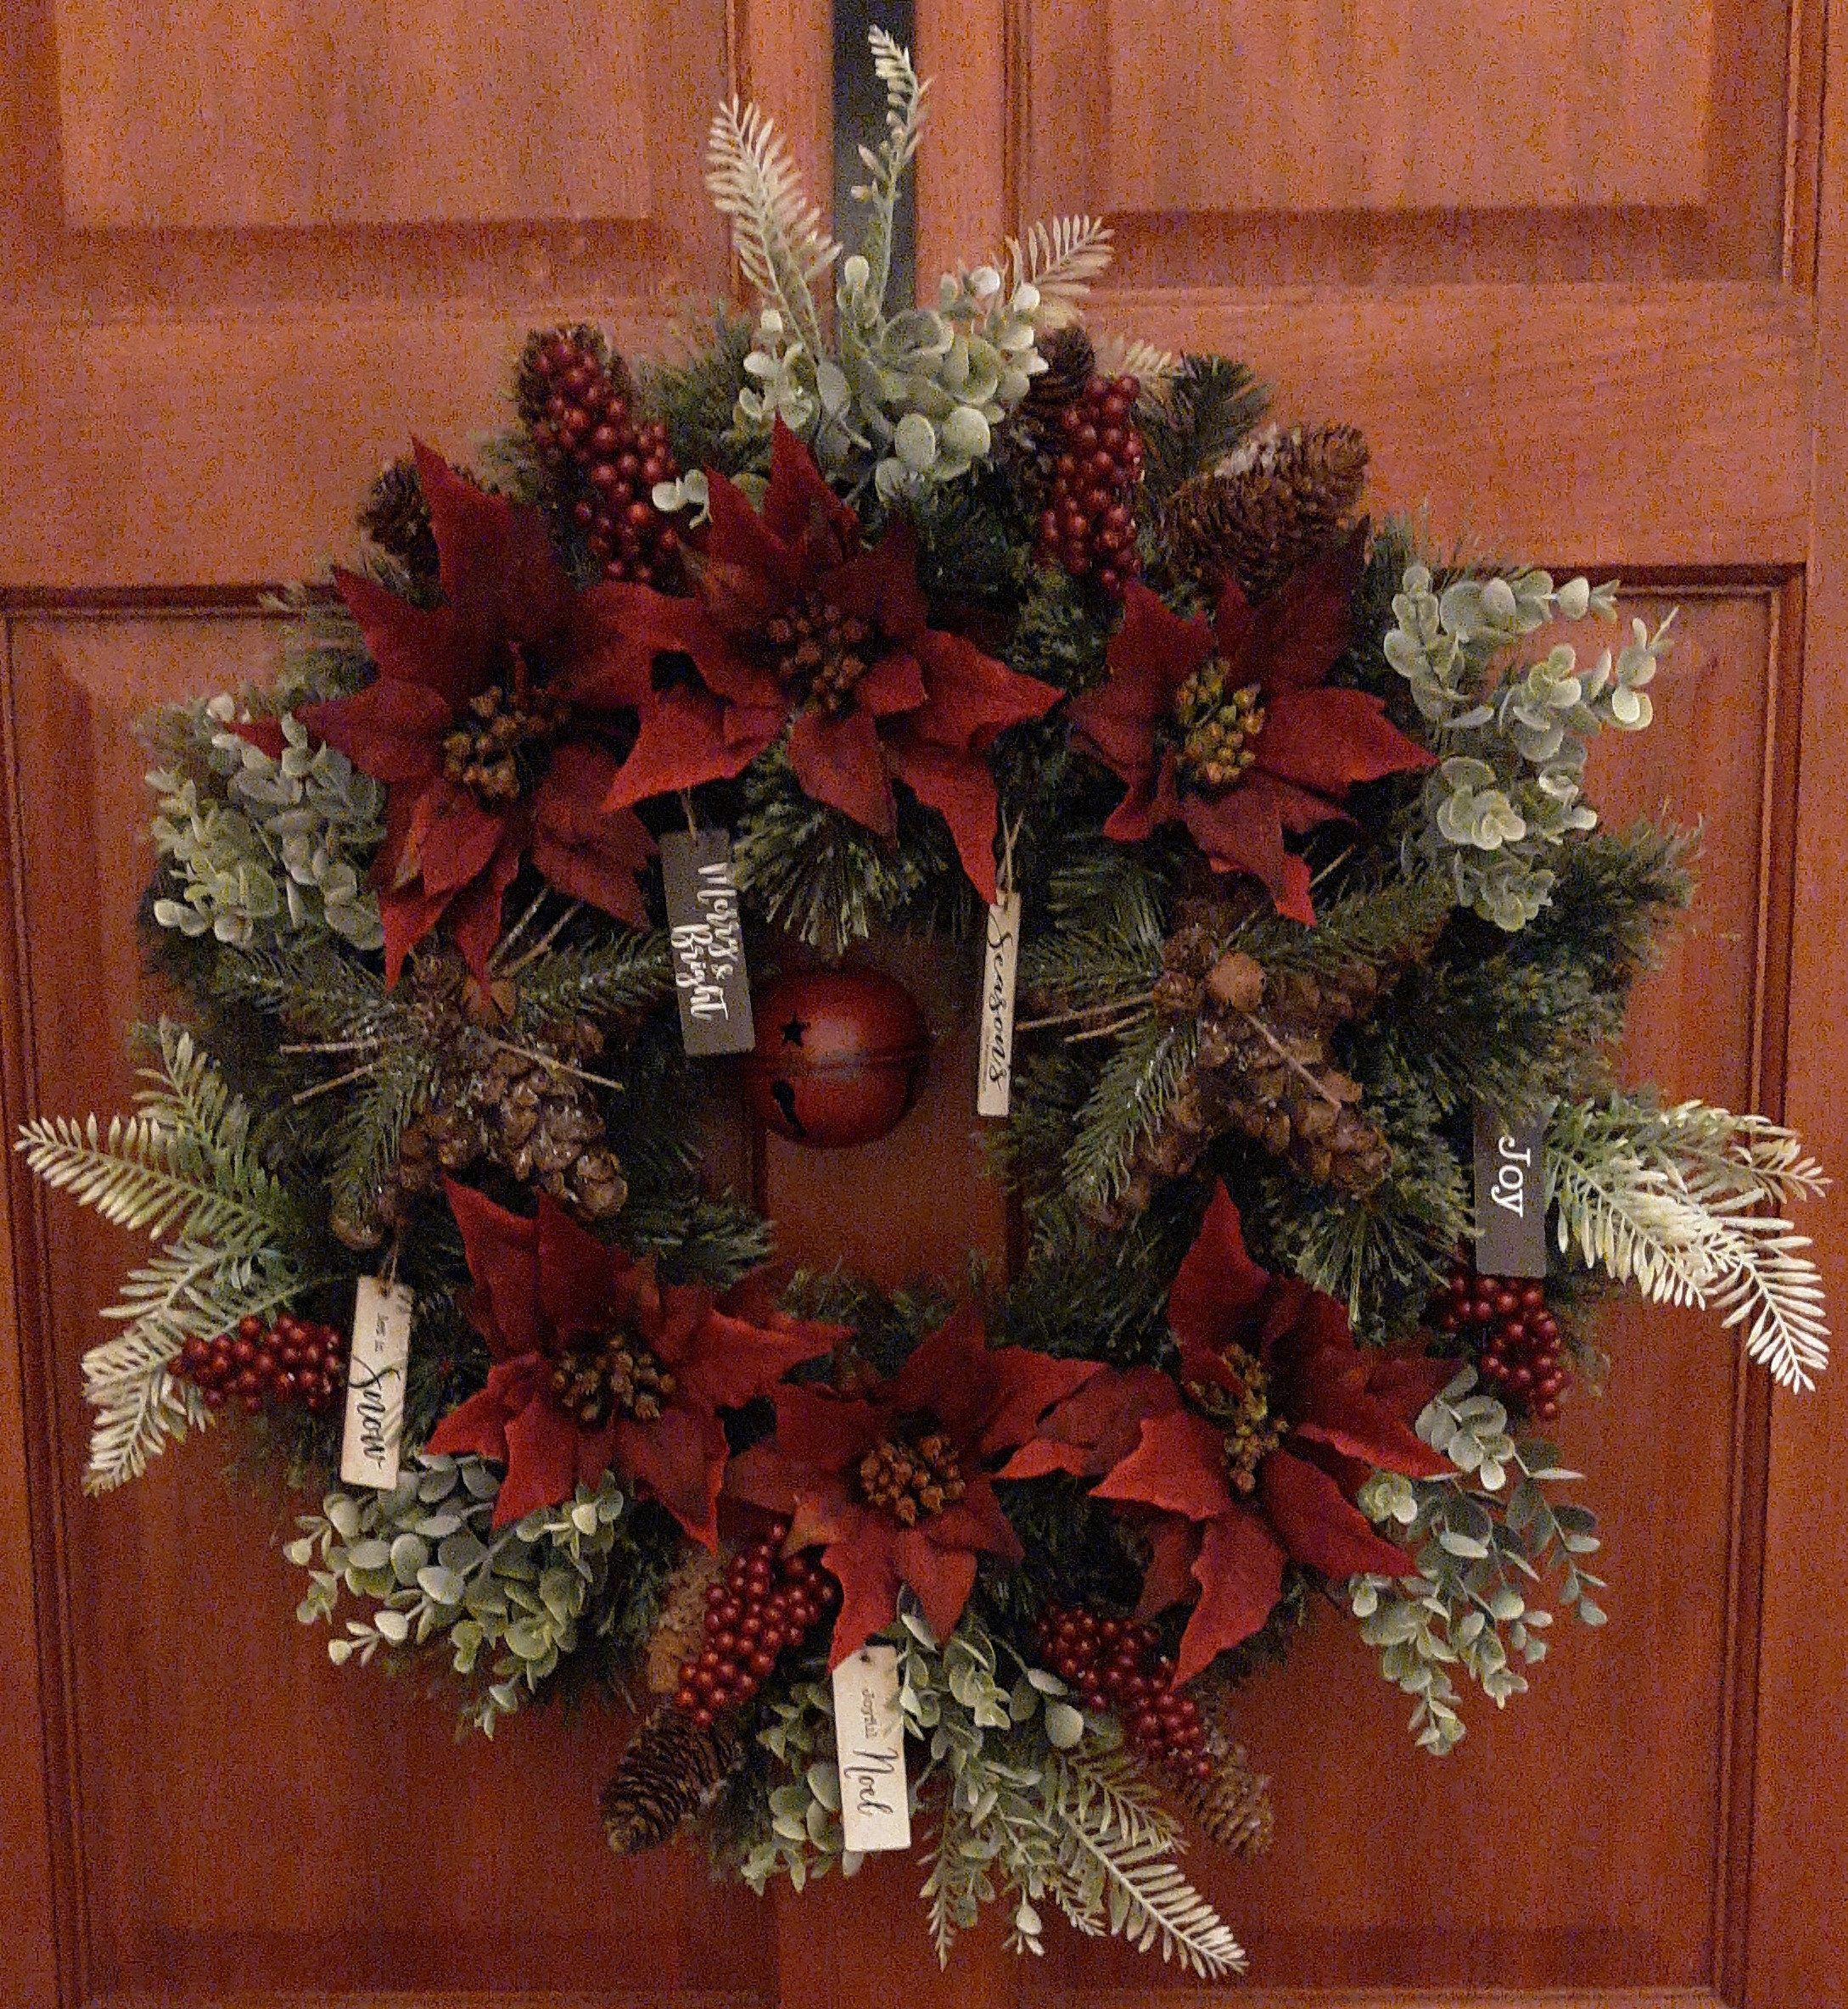 Christmas Wreath For Front Door, Winter Wreath, Poinsettia ...